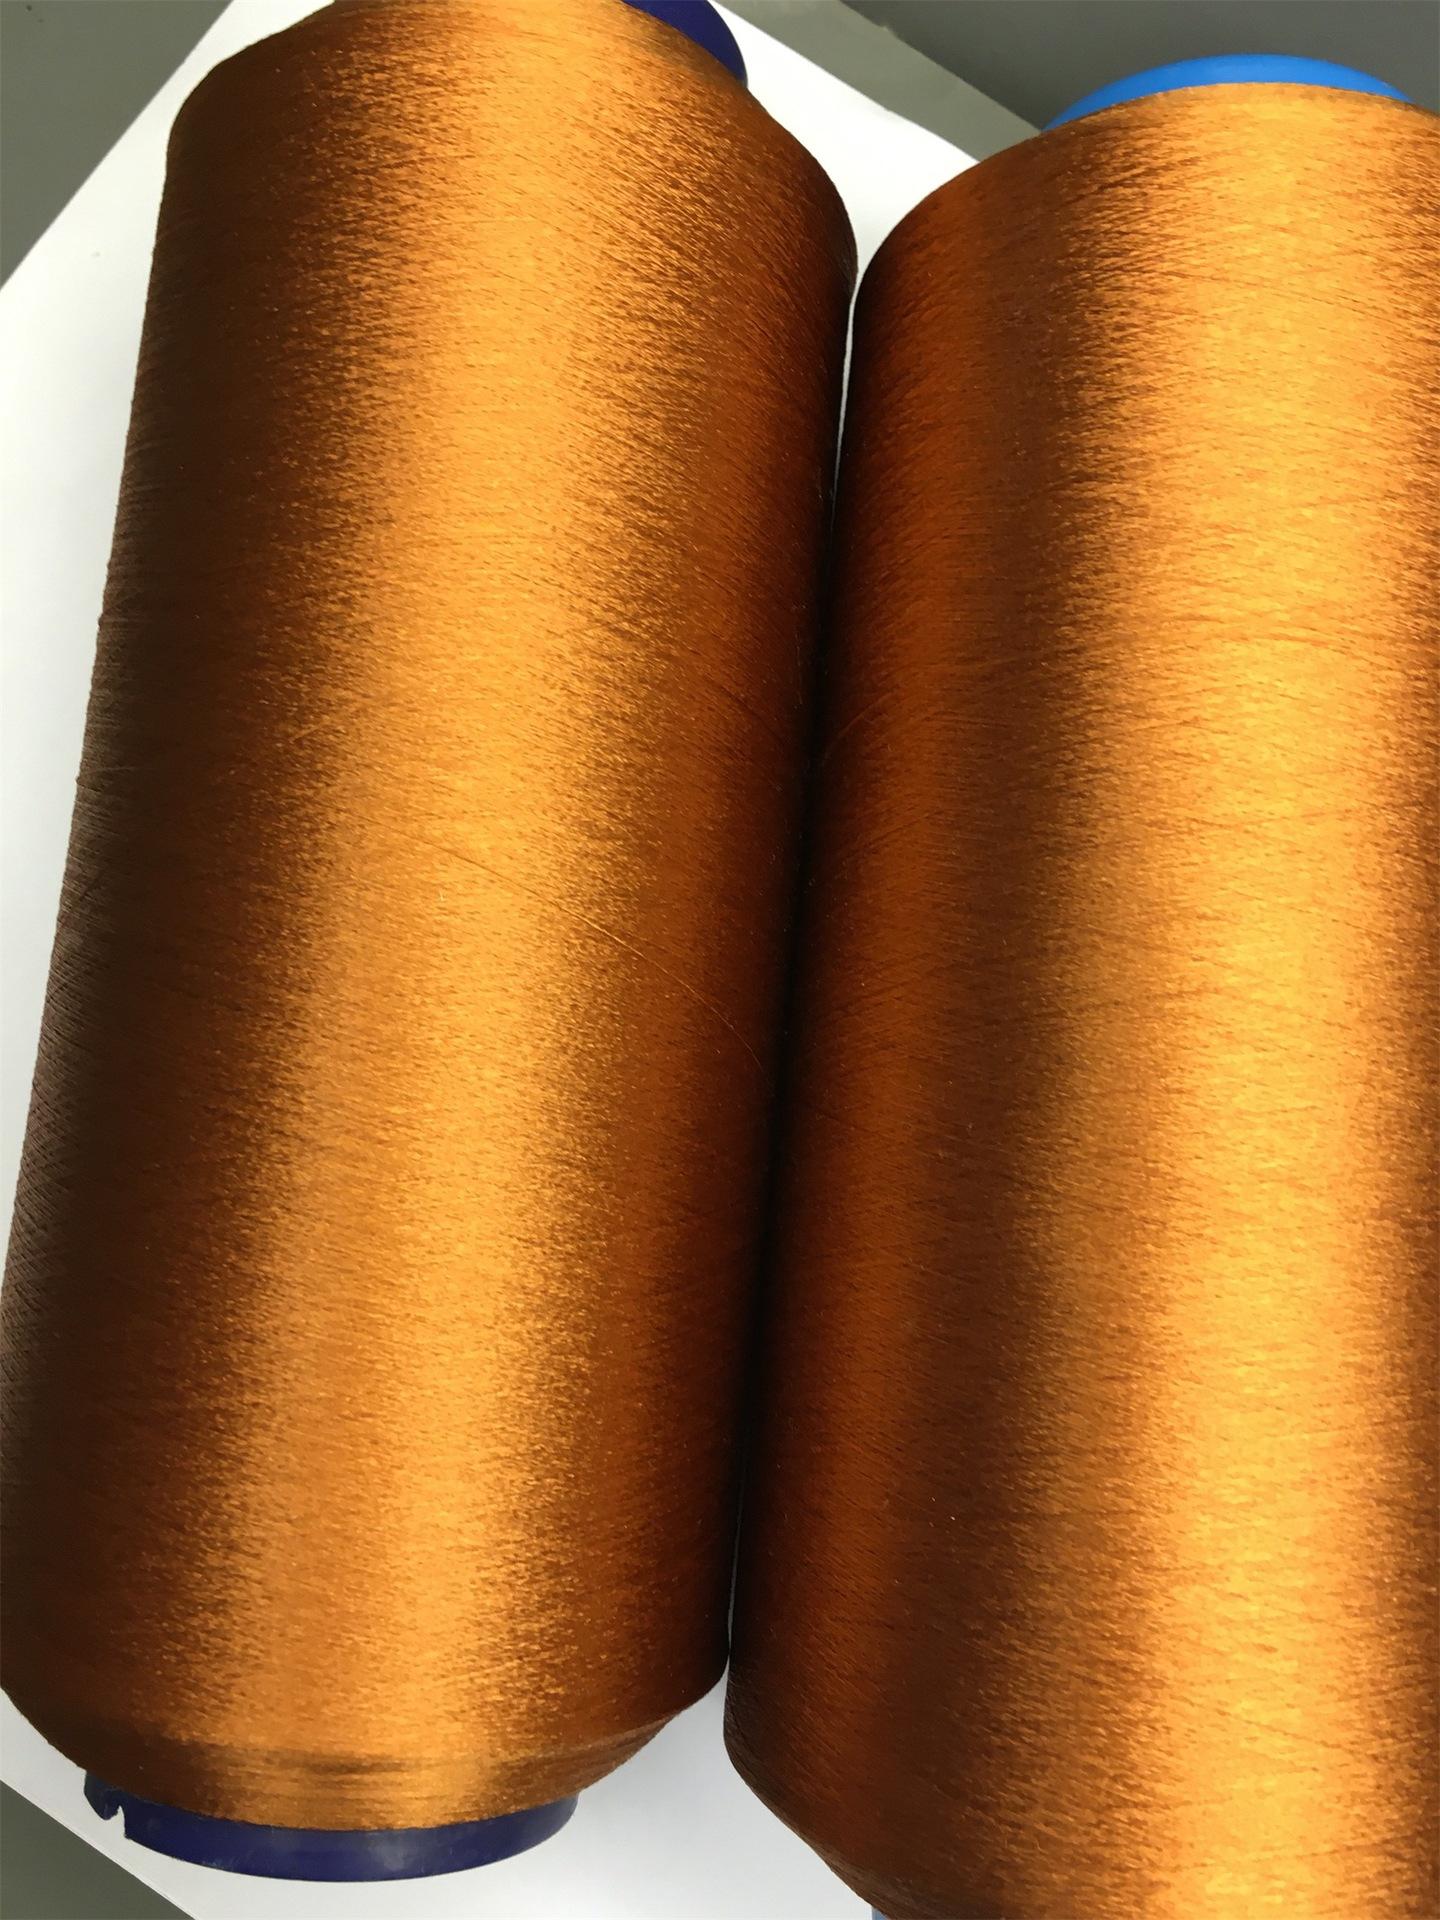 Sợi tơ lụa 60NM / 2 sợi tơ tinh khiết spot sợi tơ tằm kéo sợi